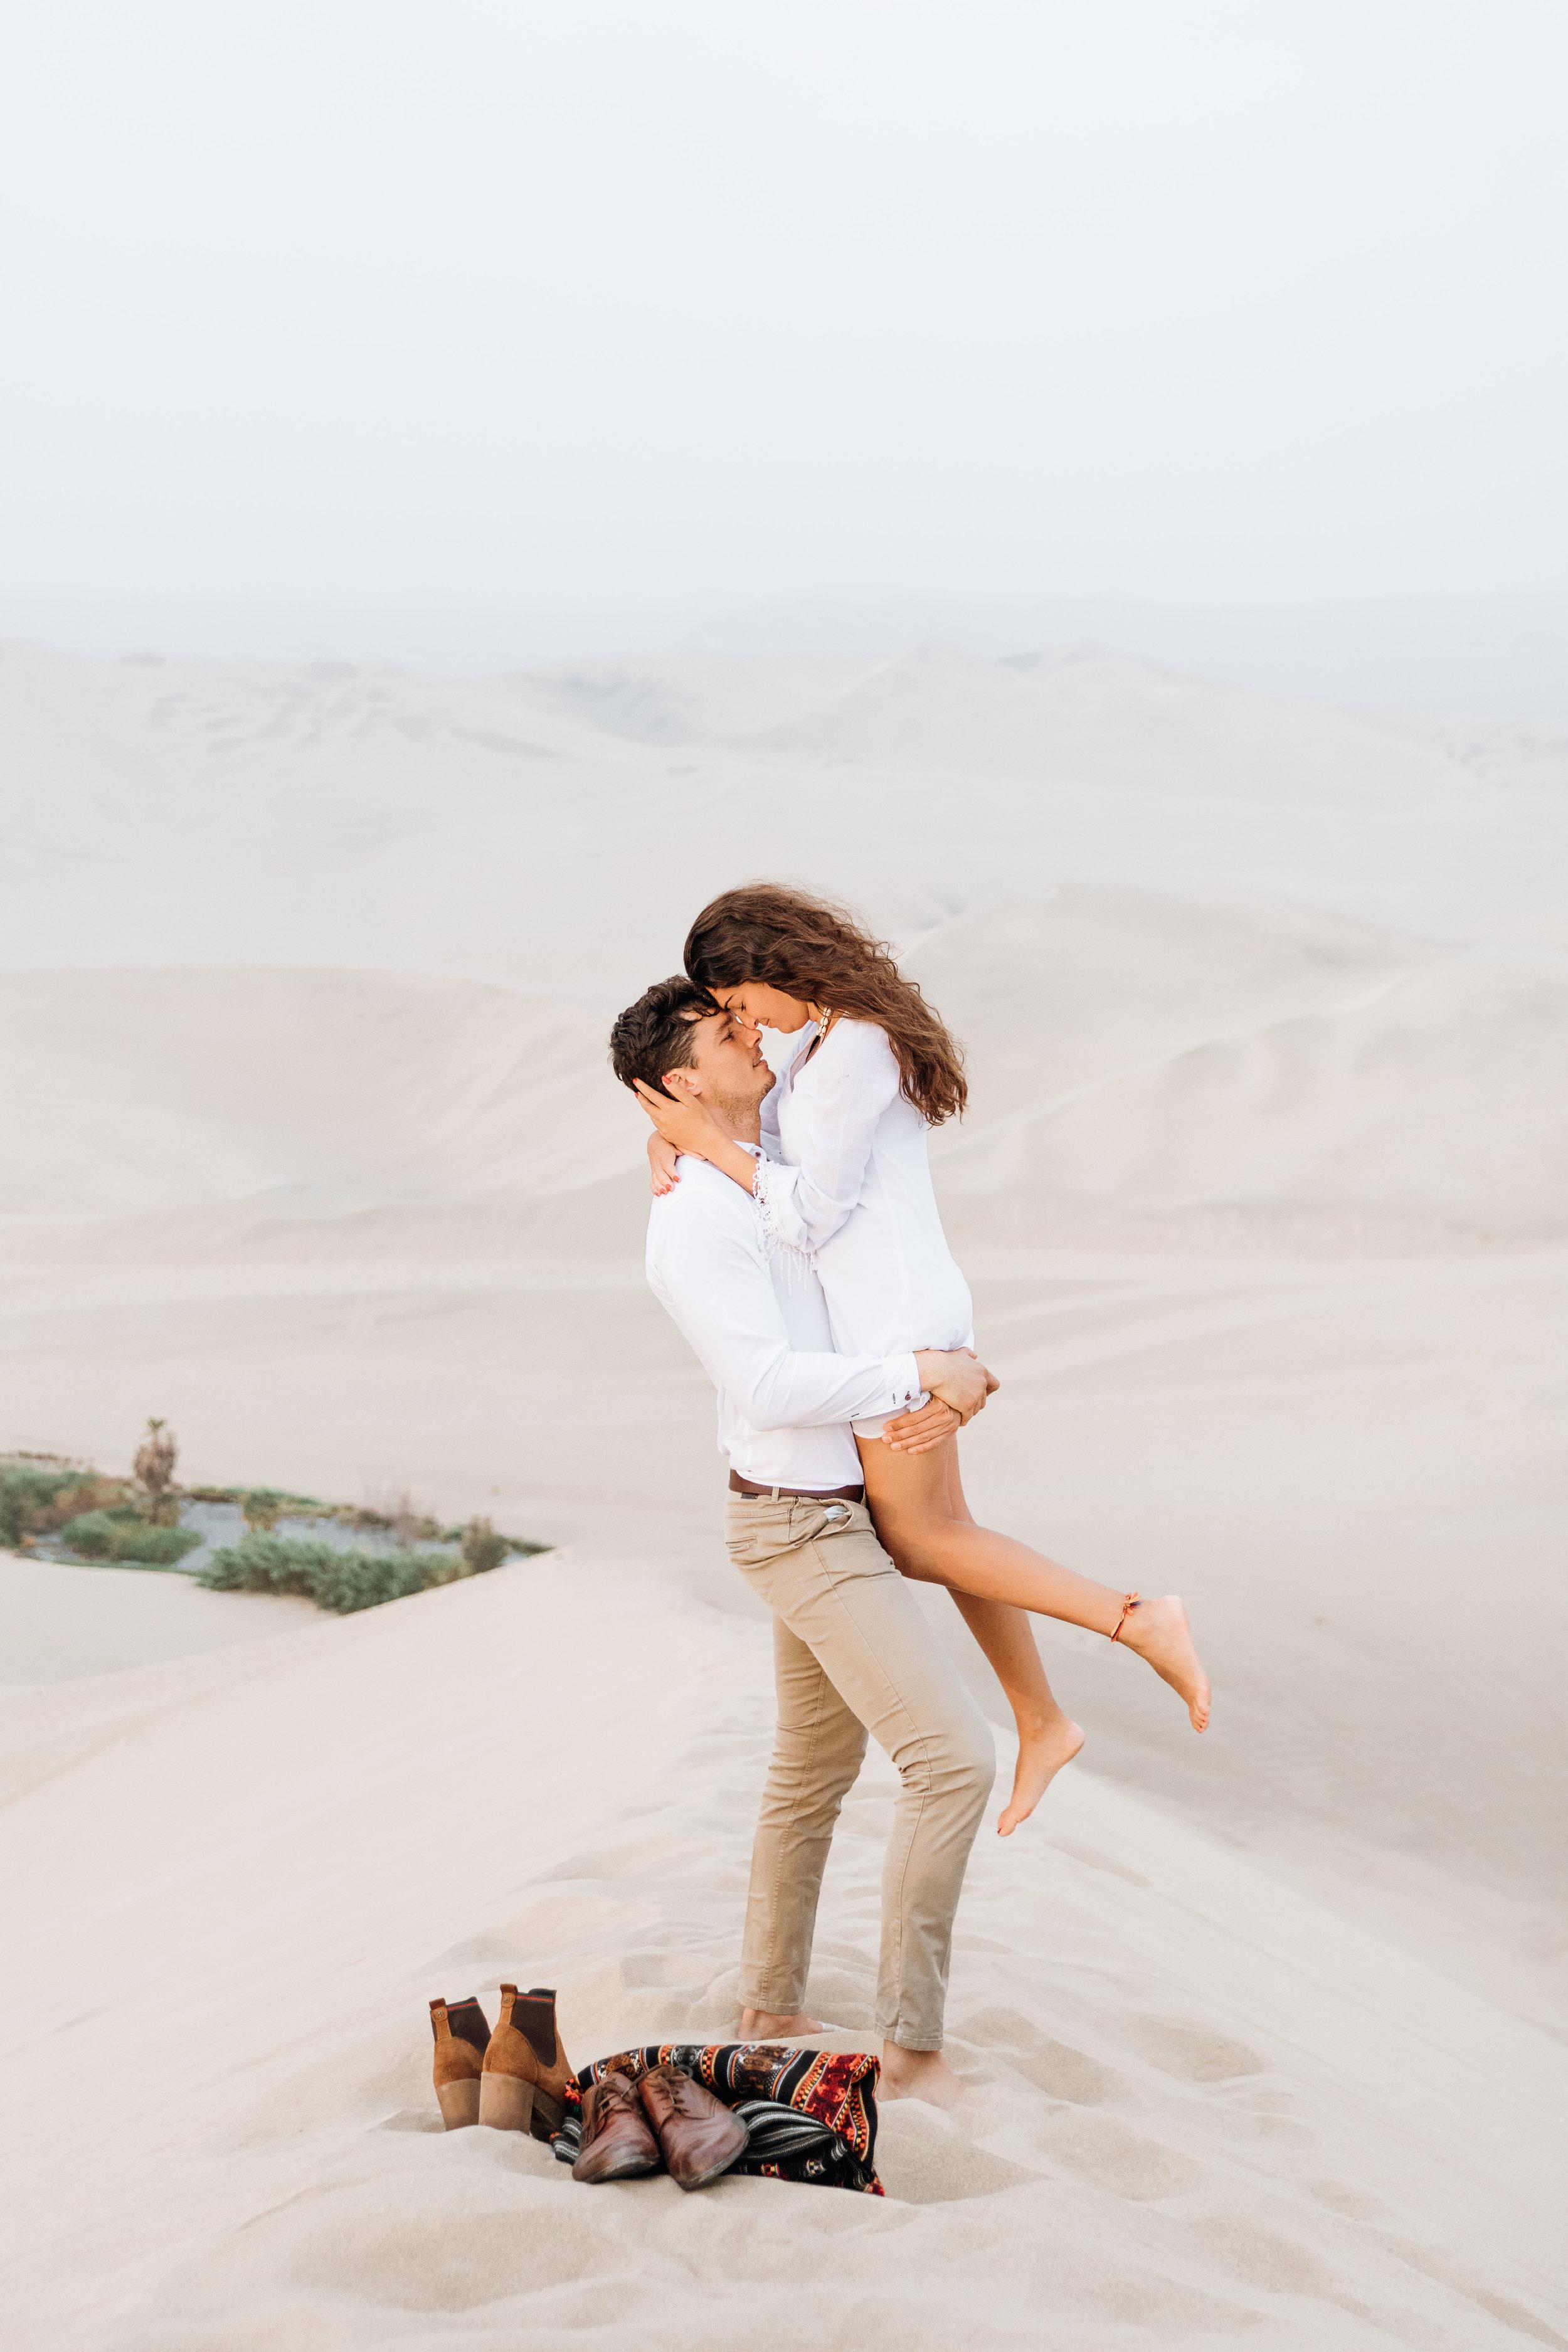 huacachina-peru-honeymoon-elopement-destination-wedding-photography-michael-cozzens-9.jpg